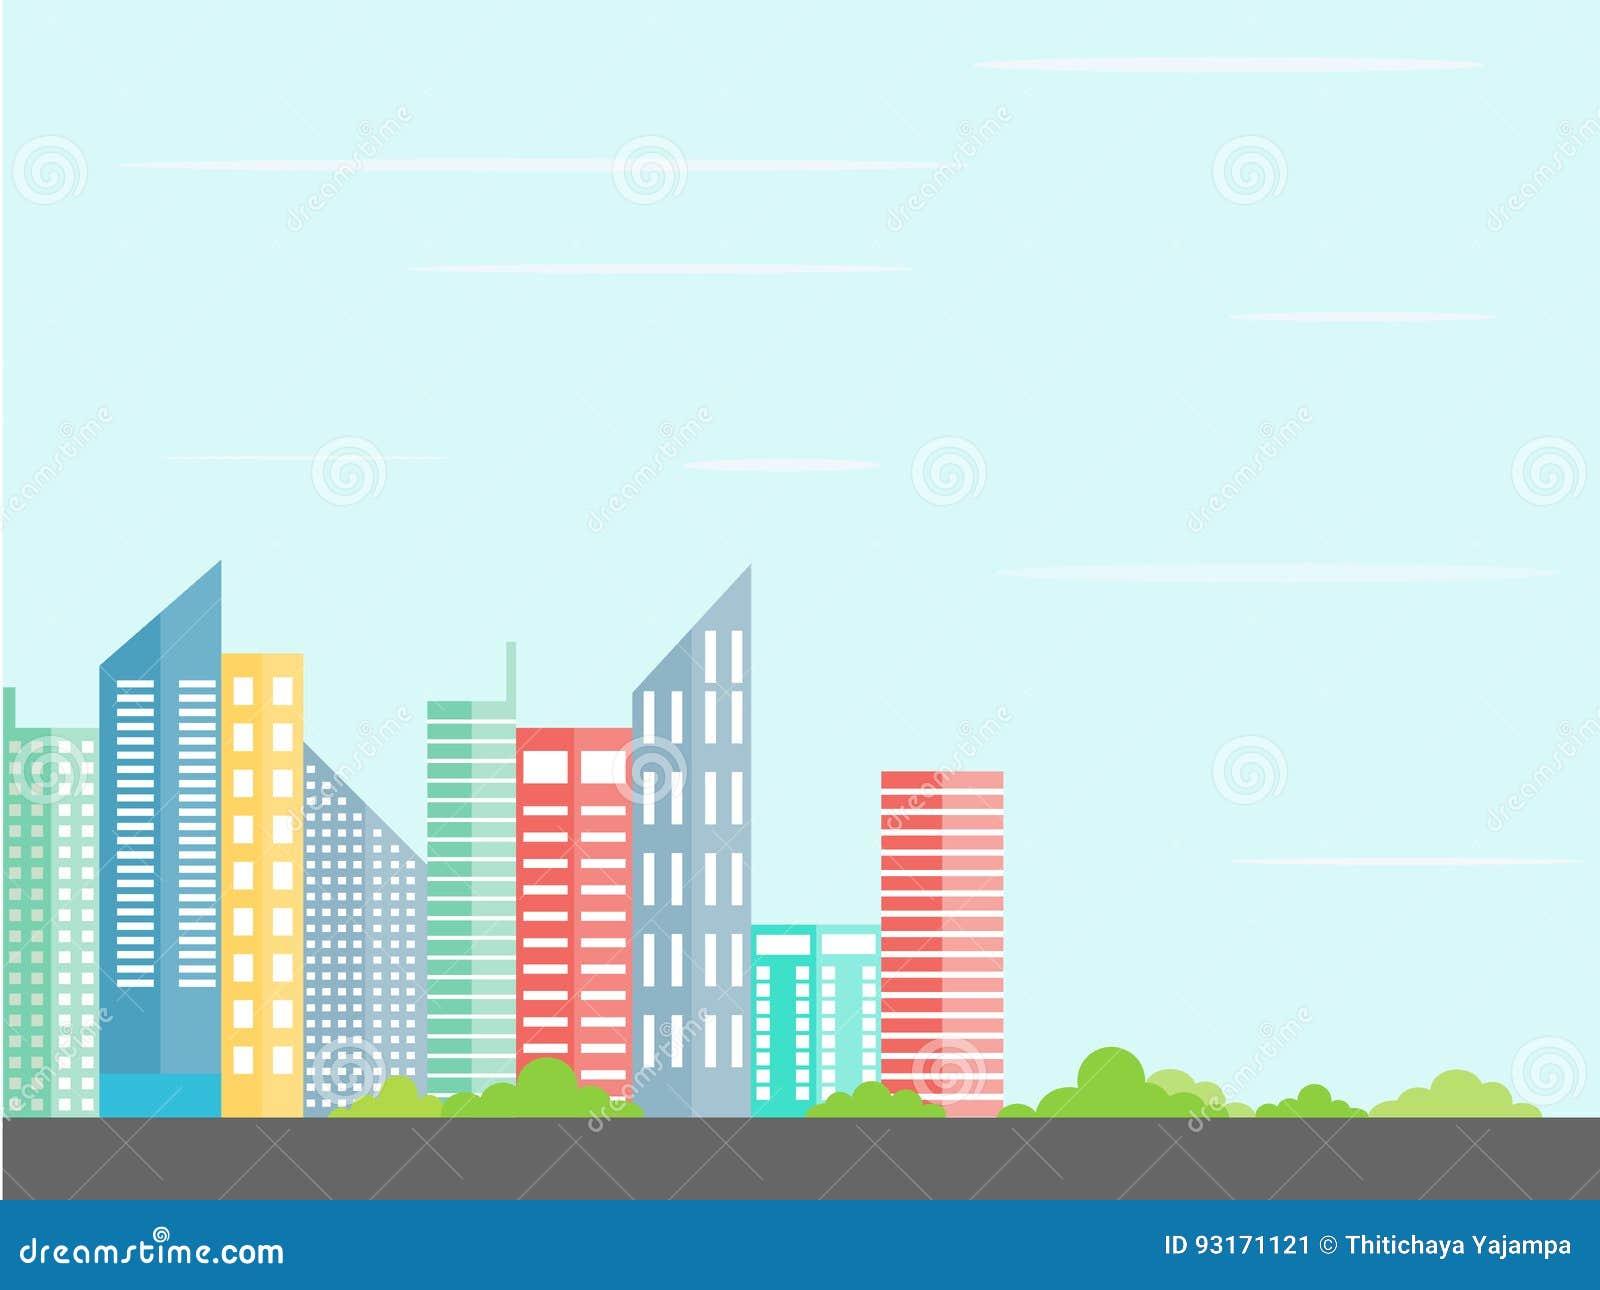 urban landscape city architecture in a minimalist style flat